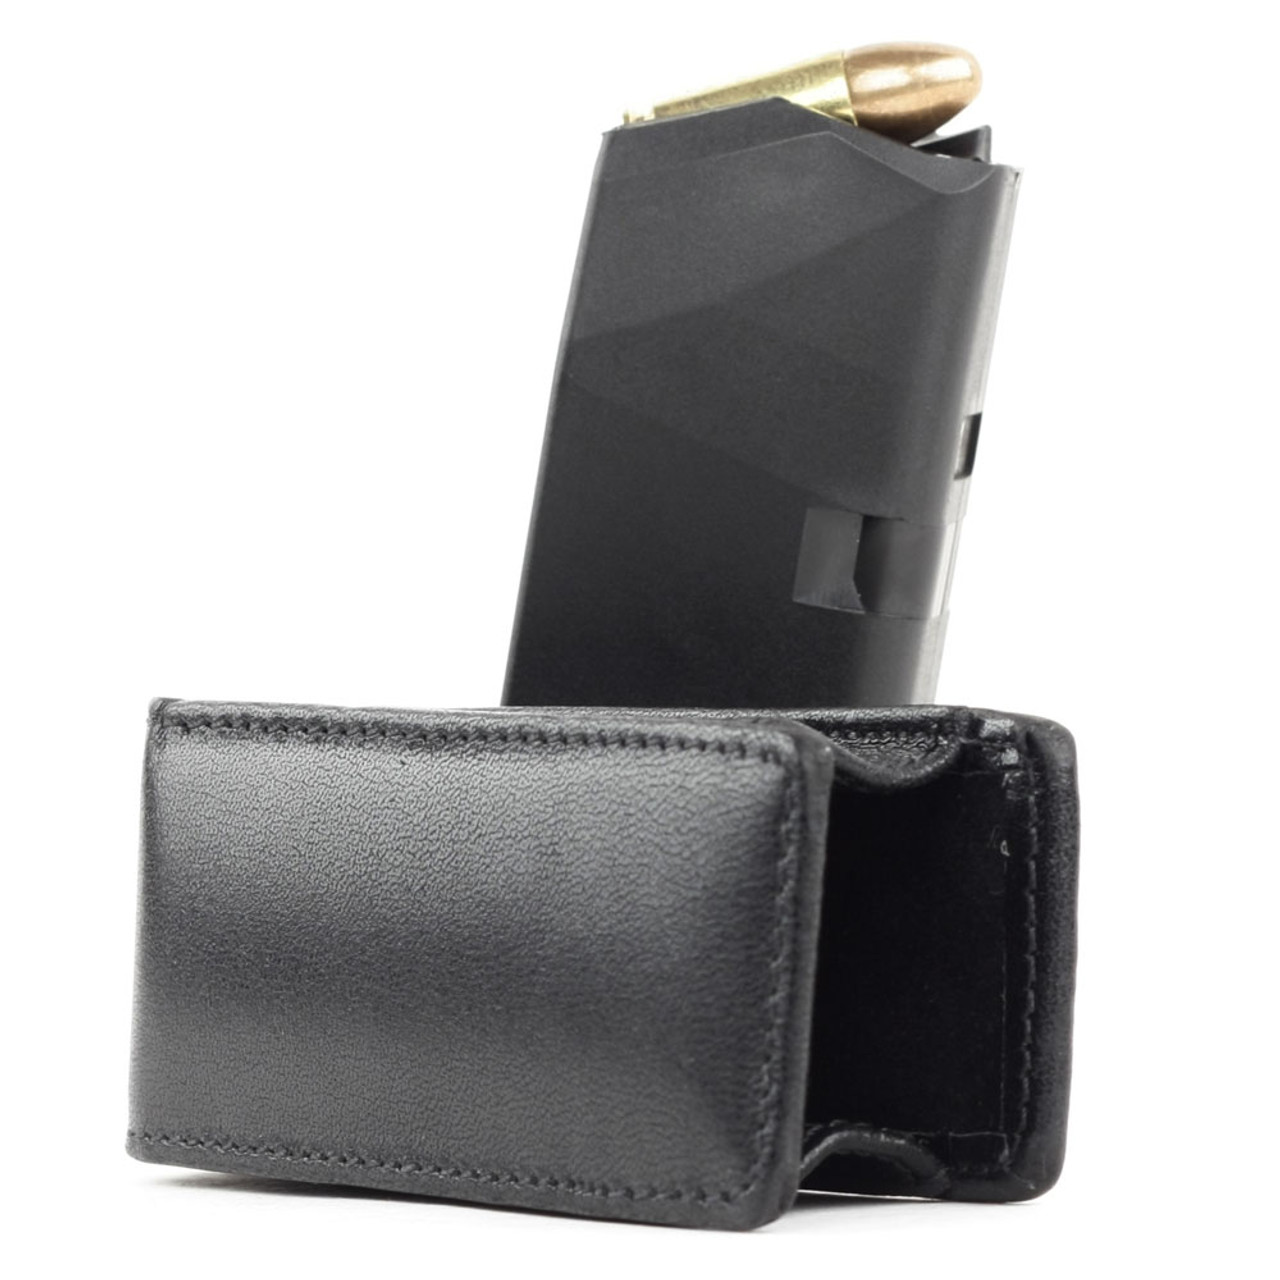 Springfield XD9sc Magazine Pocket Protector